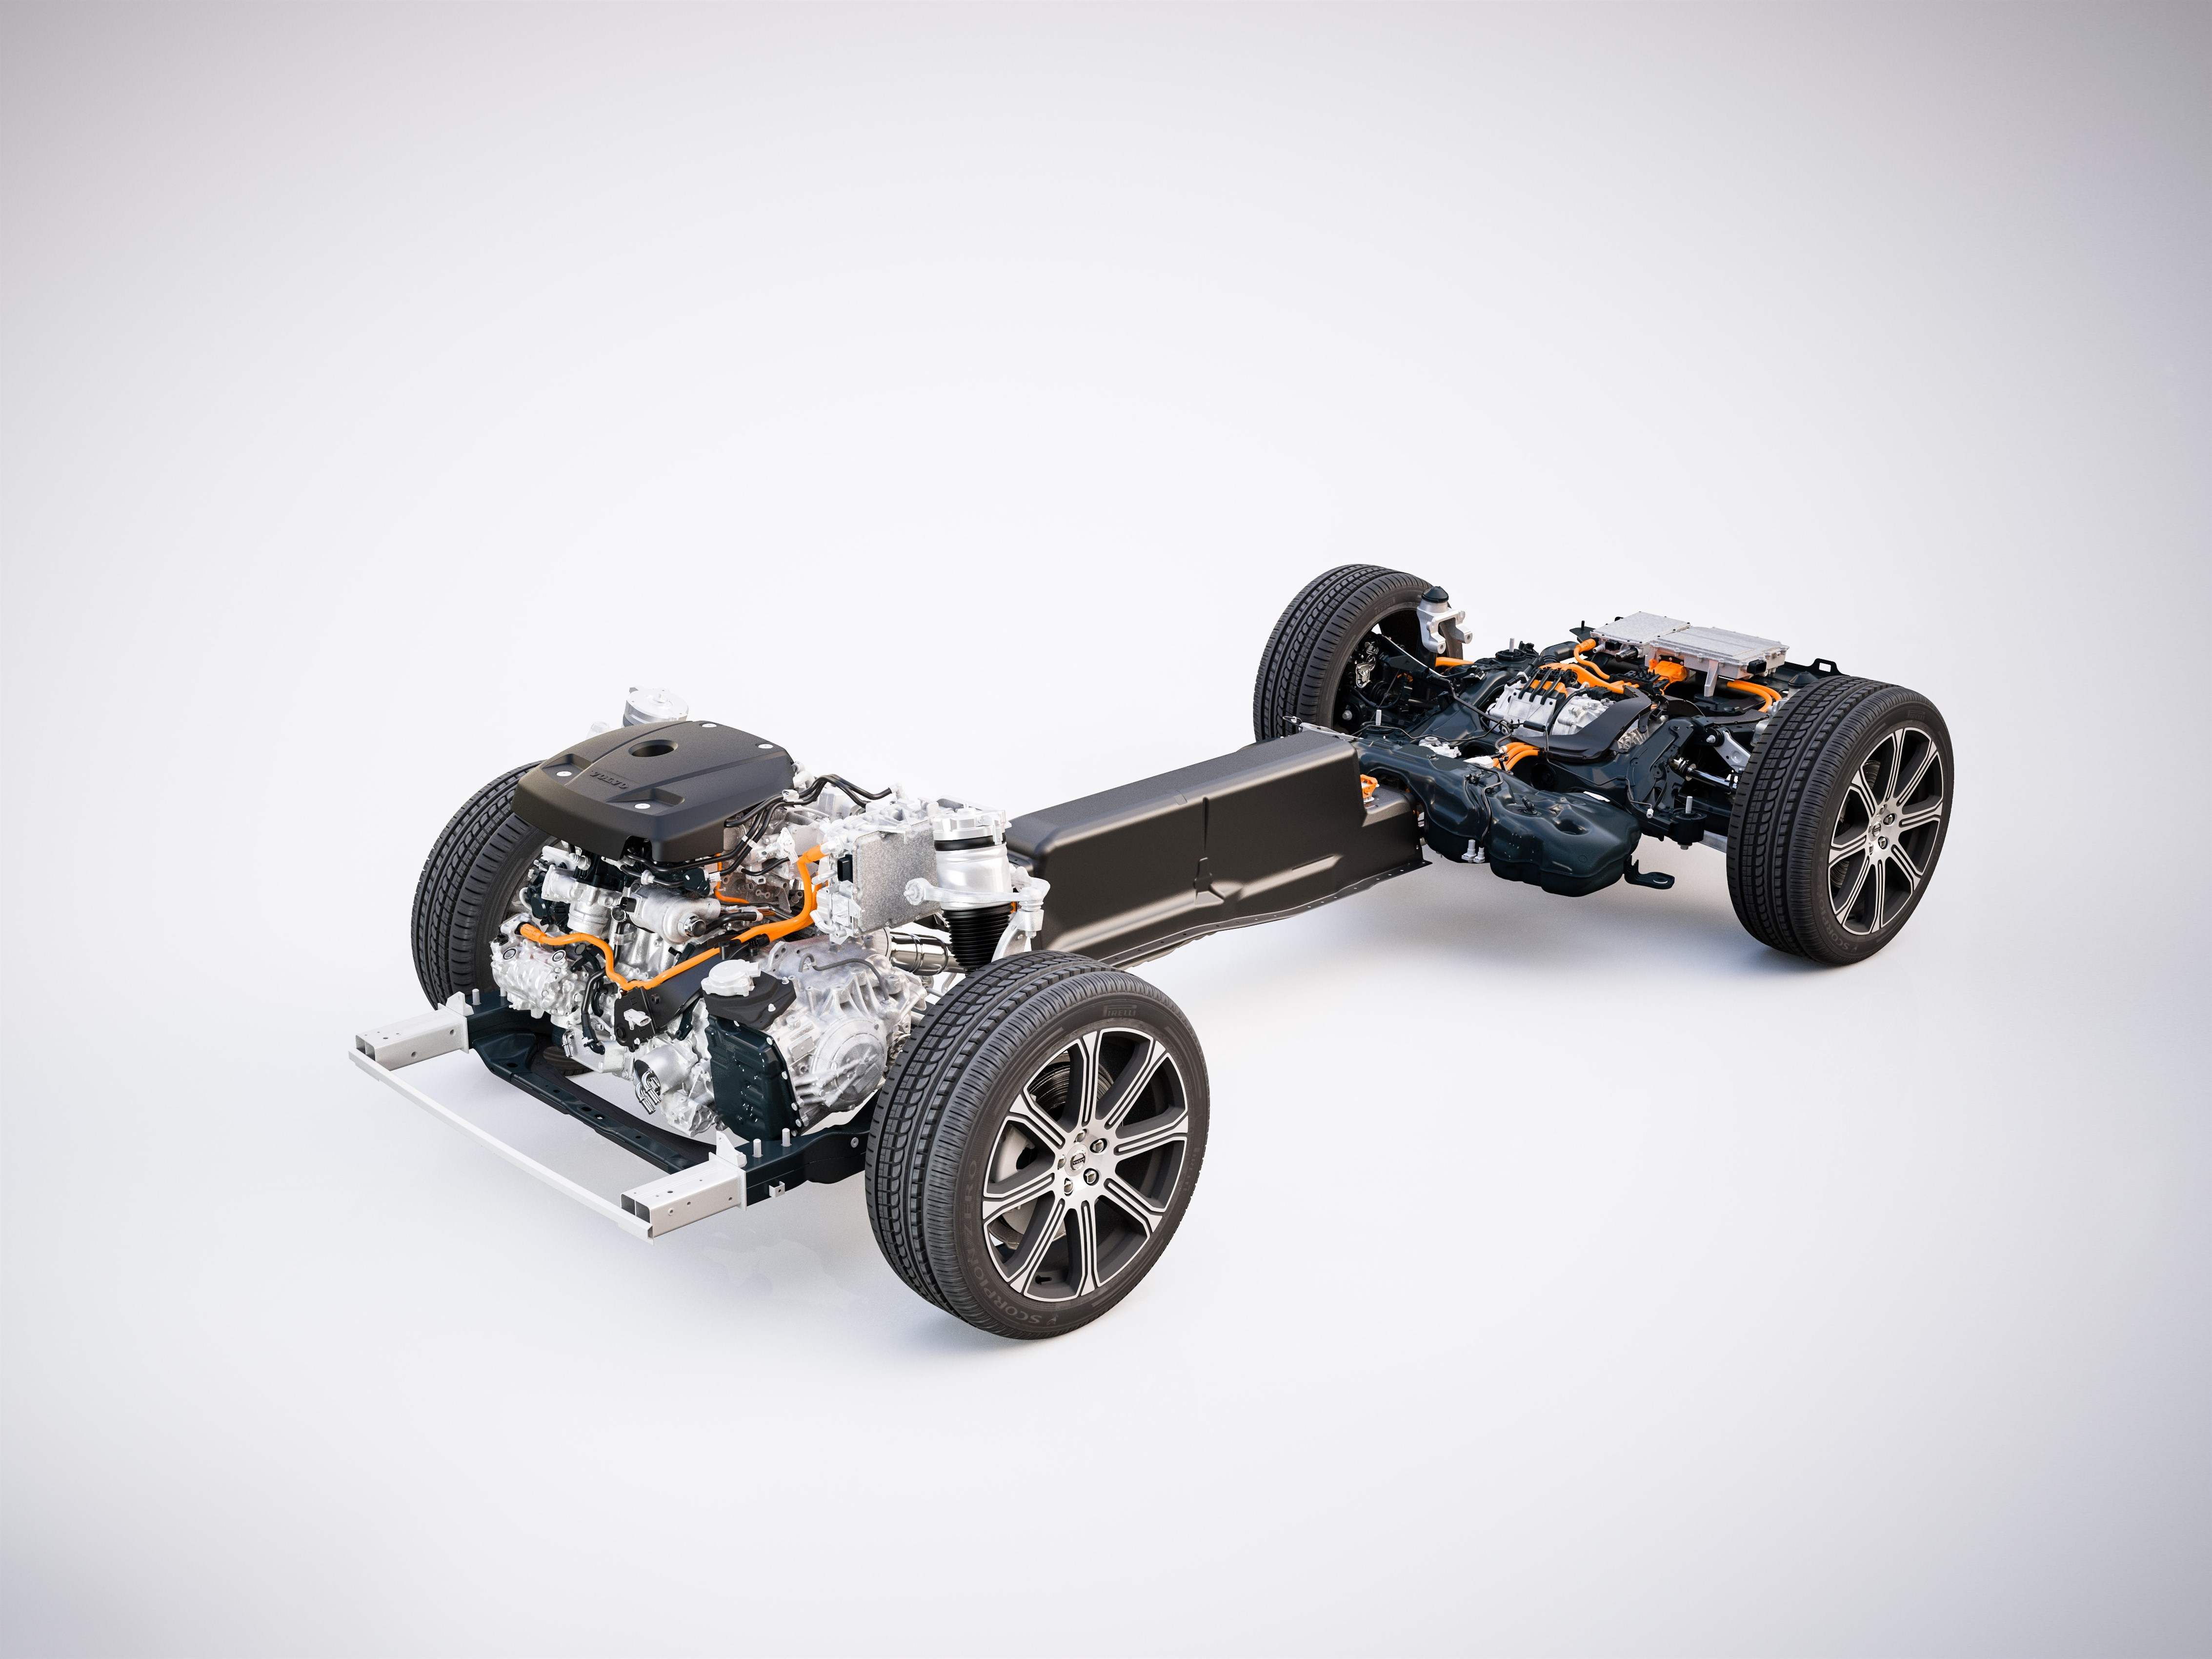 The new Volvo XC60 - T8 powertrain